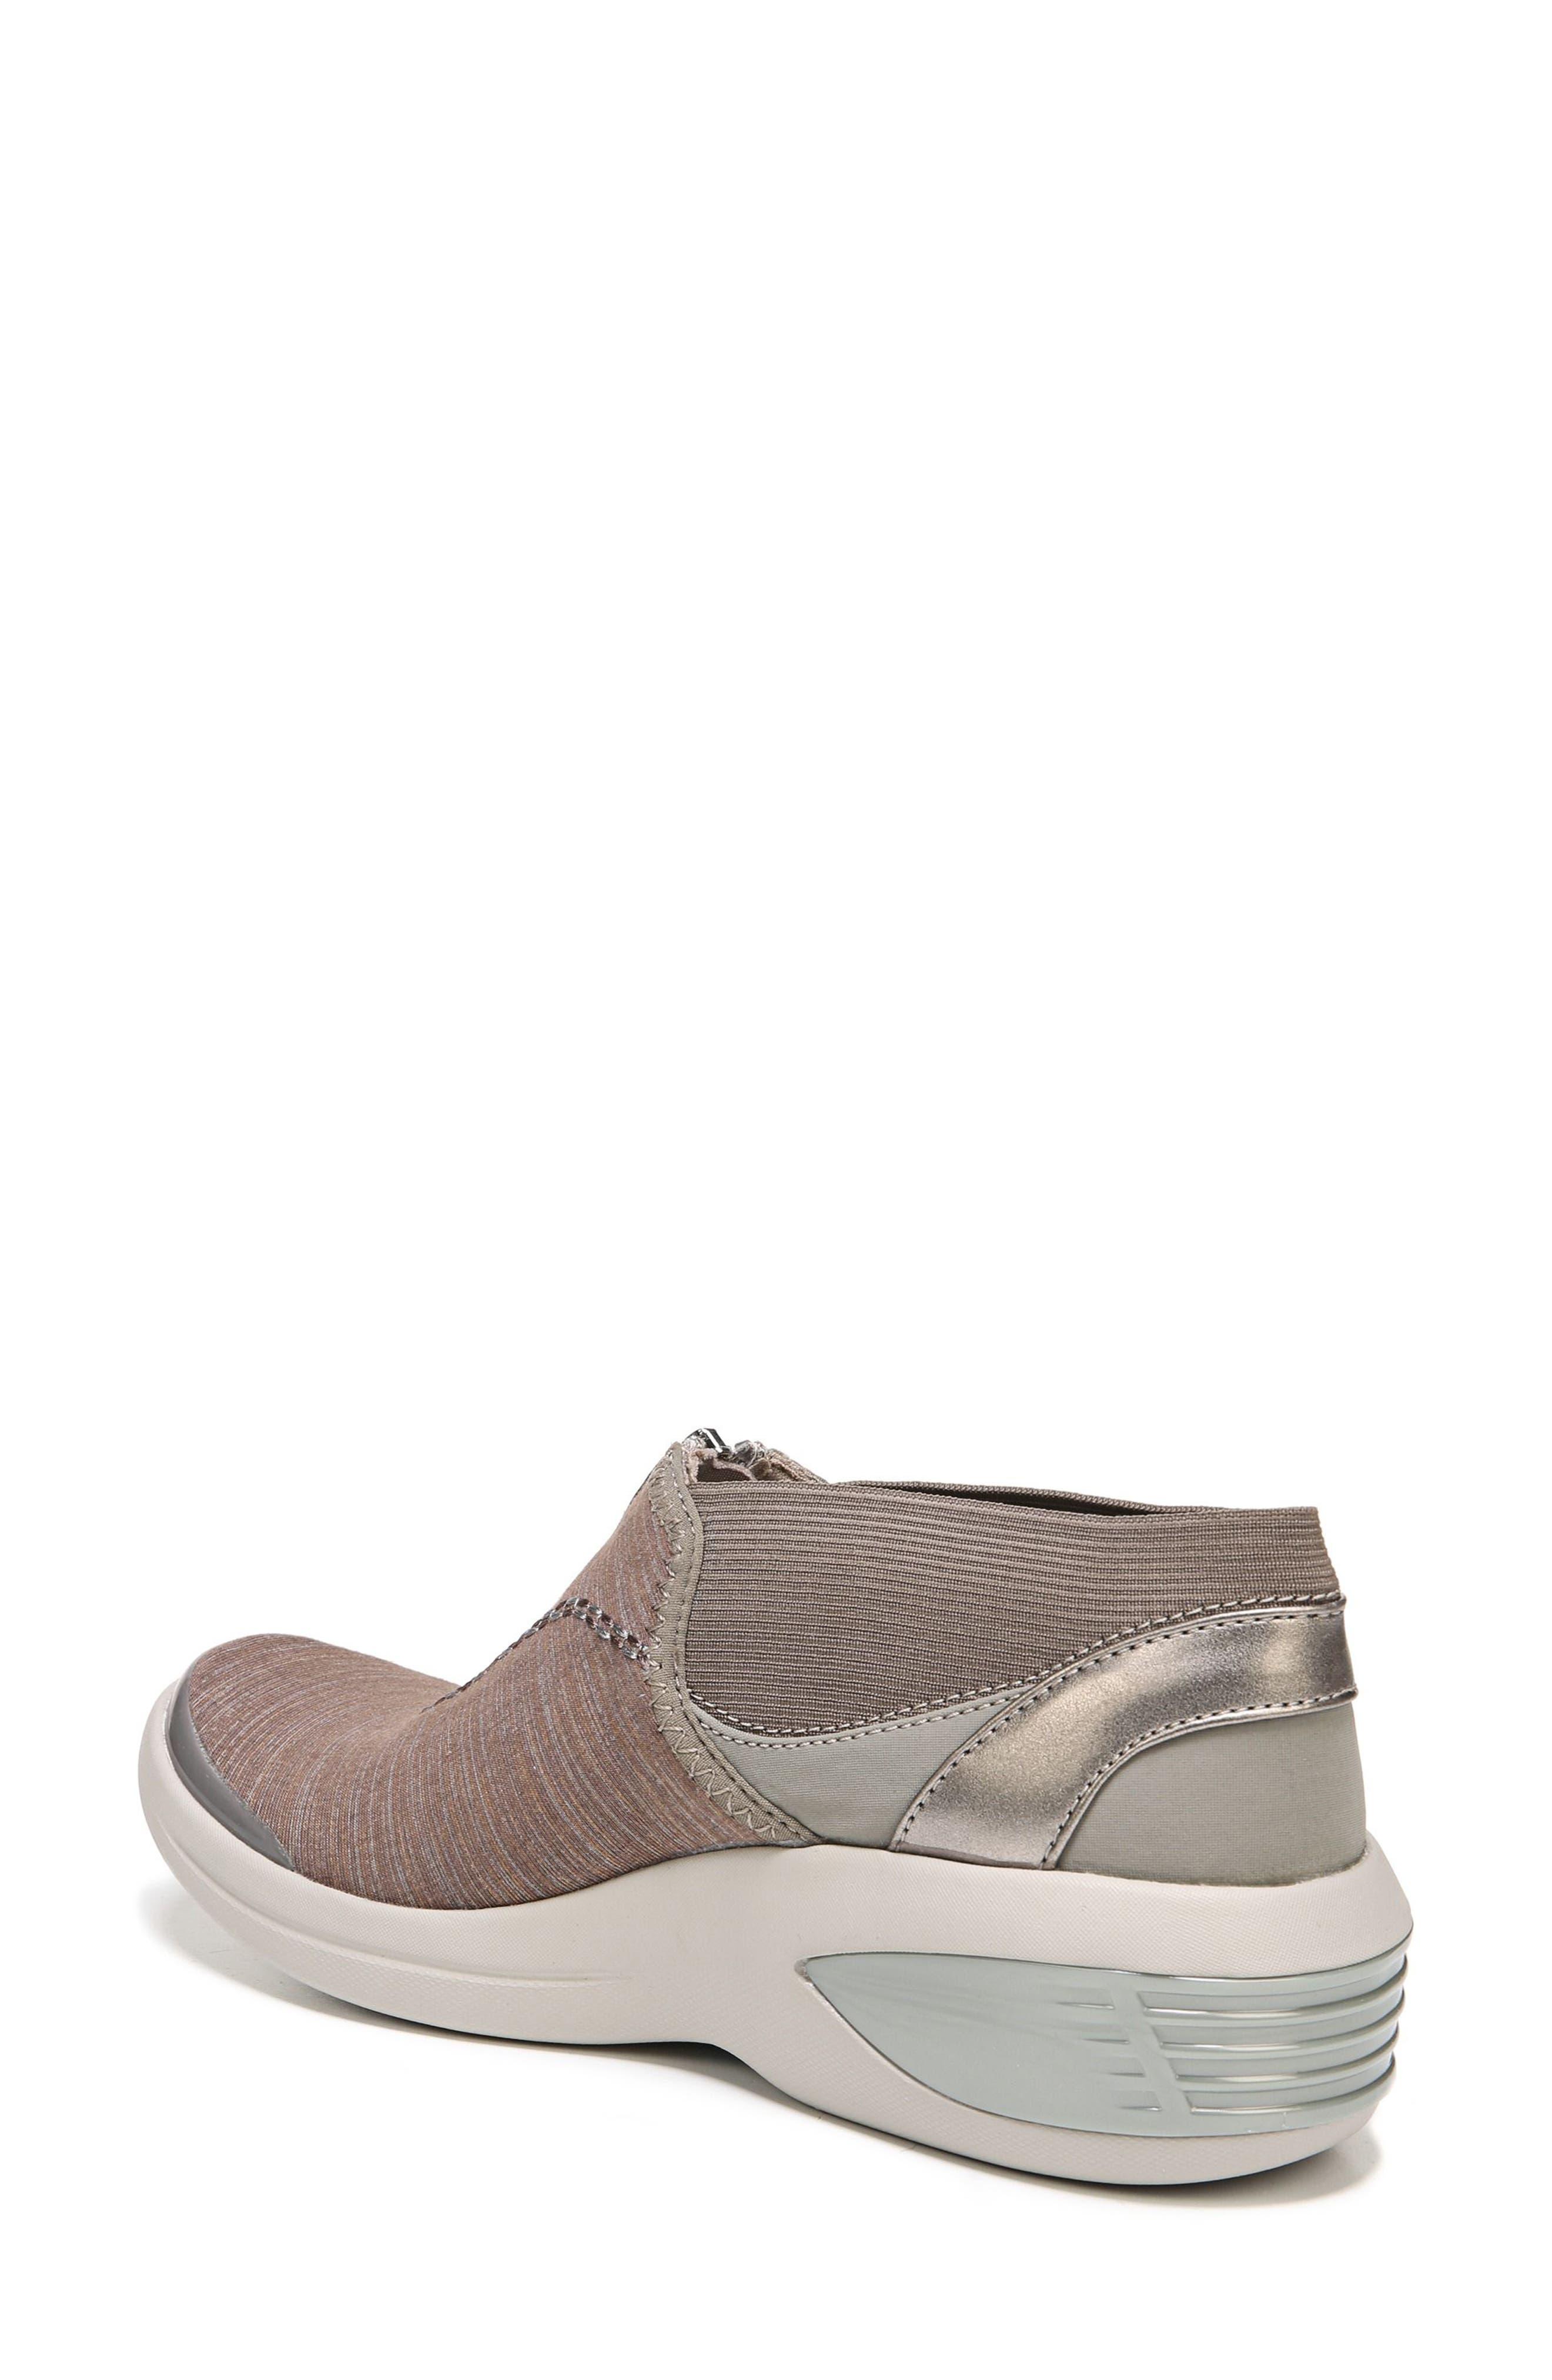 BZEES, Fling Wedge Sneaker, Alternate thumbnail 2, color, BROWN FABRIC